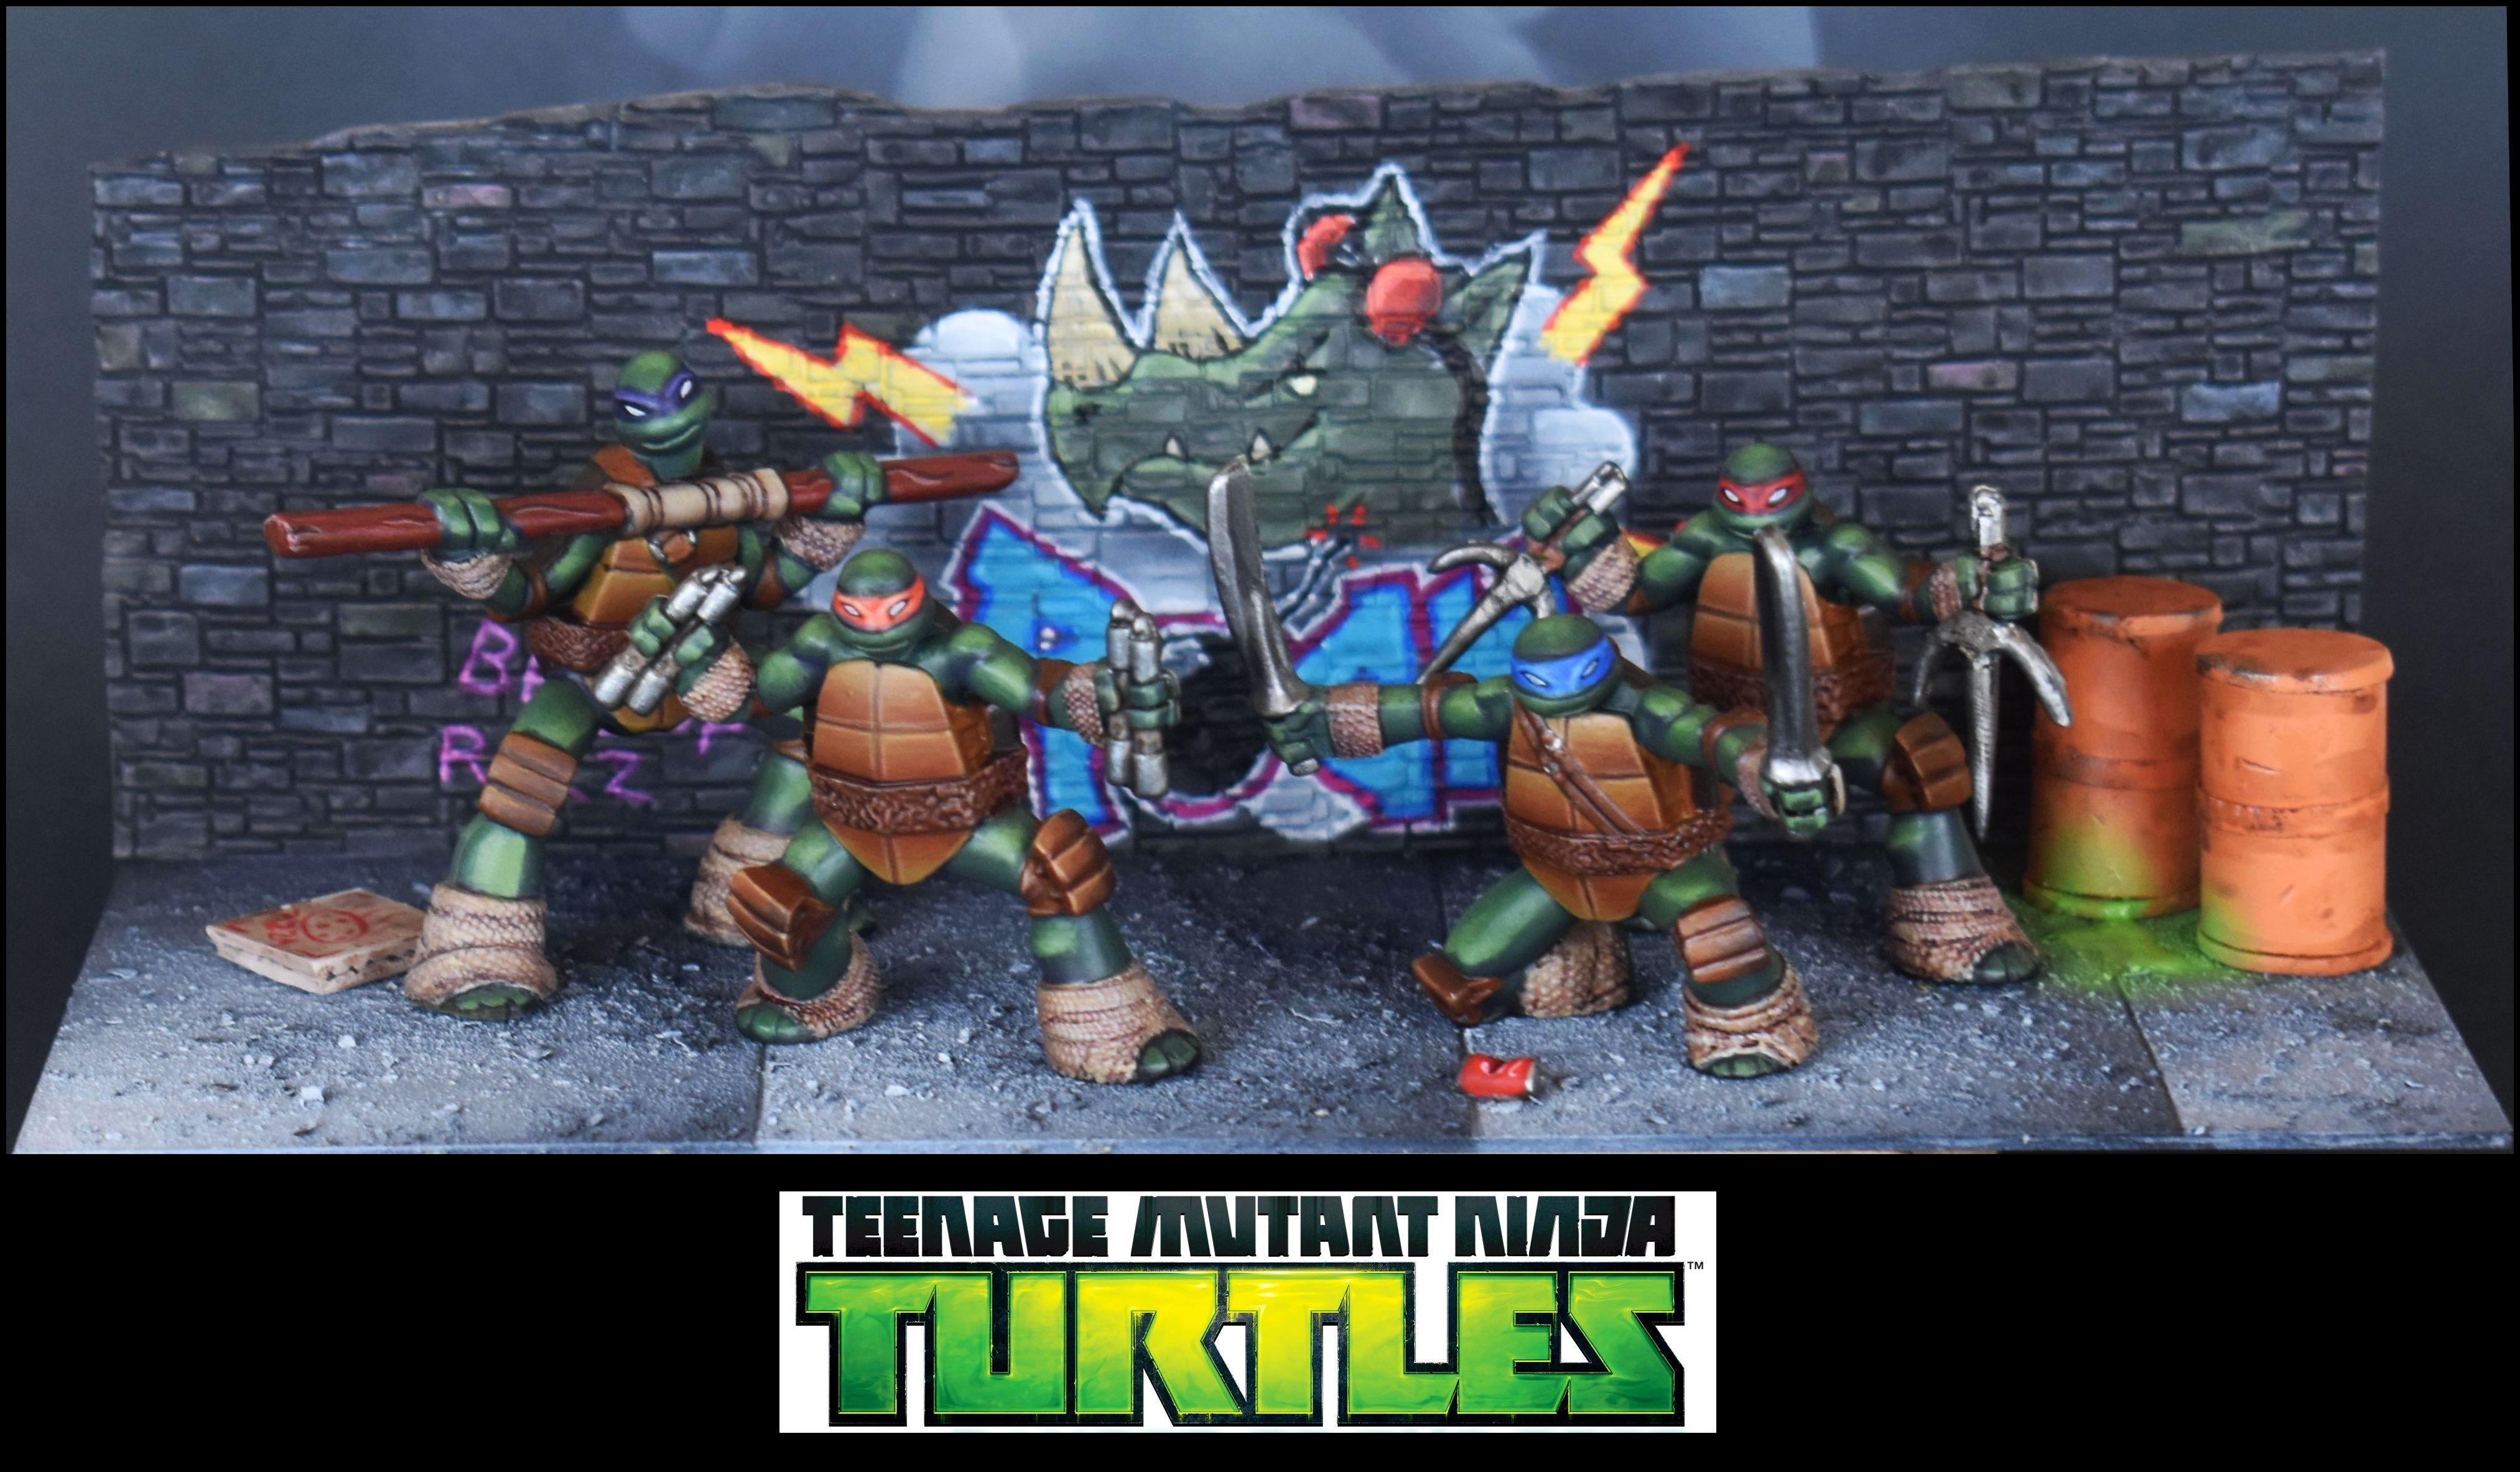 Diorama, Donatello, Leonardo, Michelangelo, Mutant, Ninjas, Raphael, Scratch Build, Set, Teenage, Tmnt, Toy, Turtles